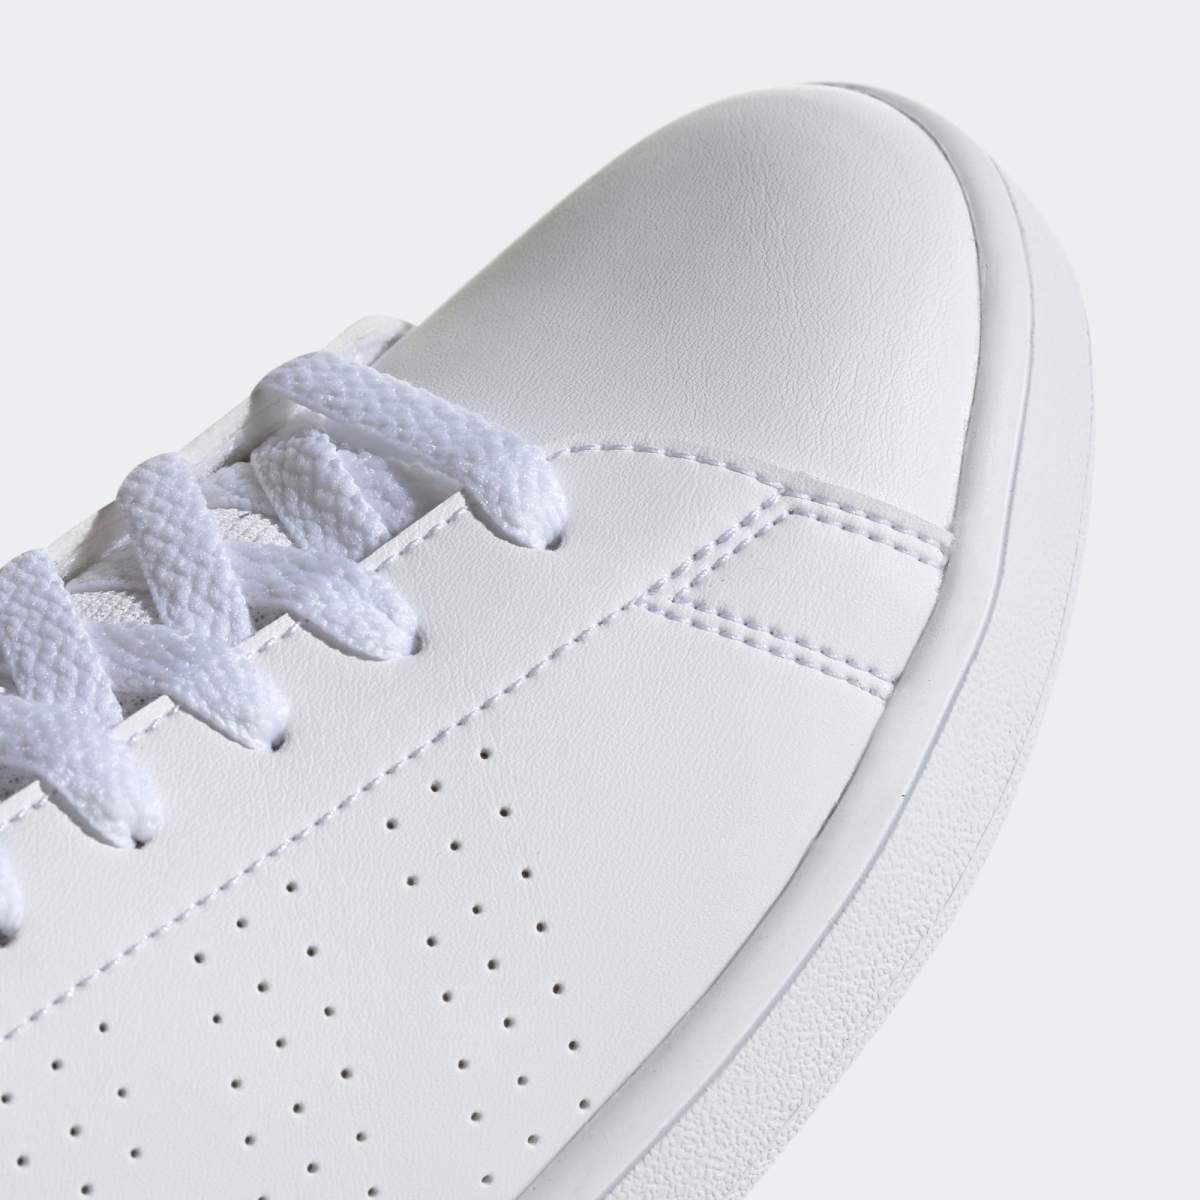 Chaussure_Advantage_Blanc_EF0211_42_detail